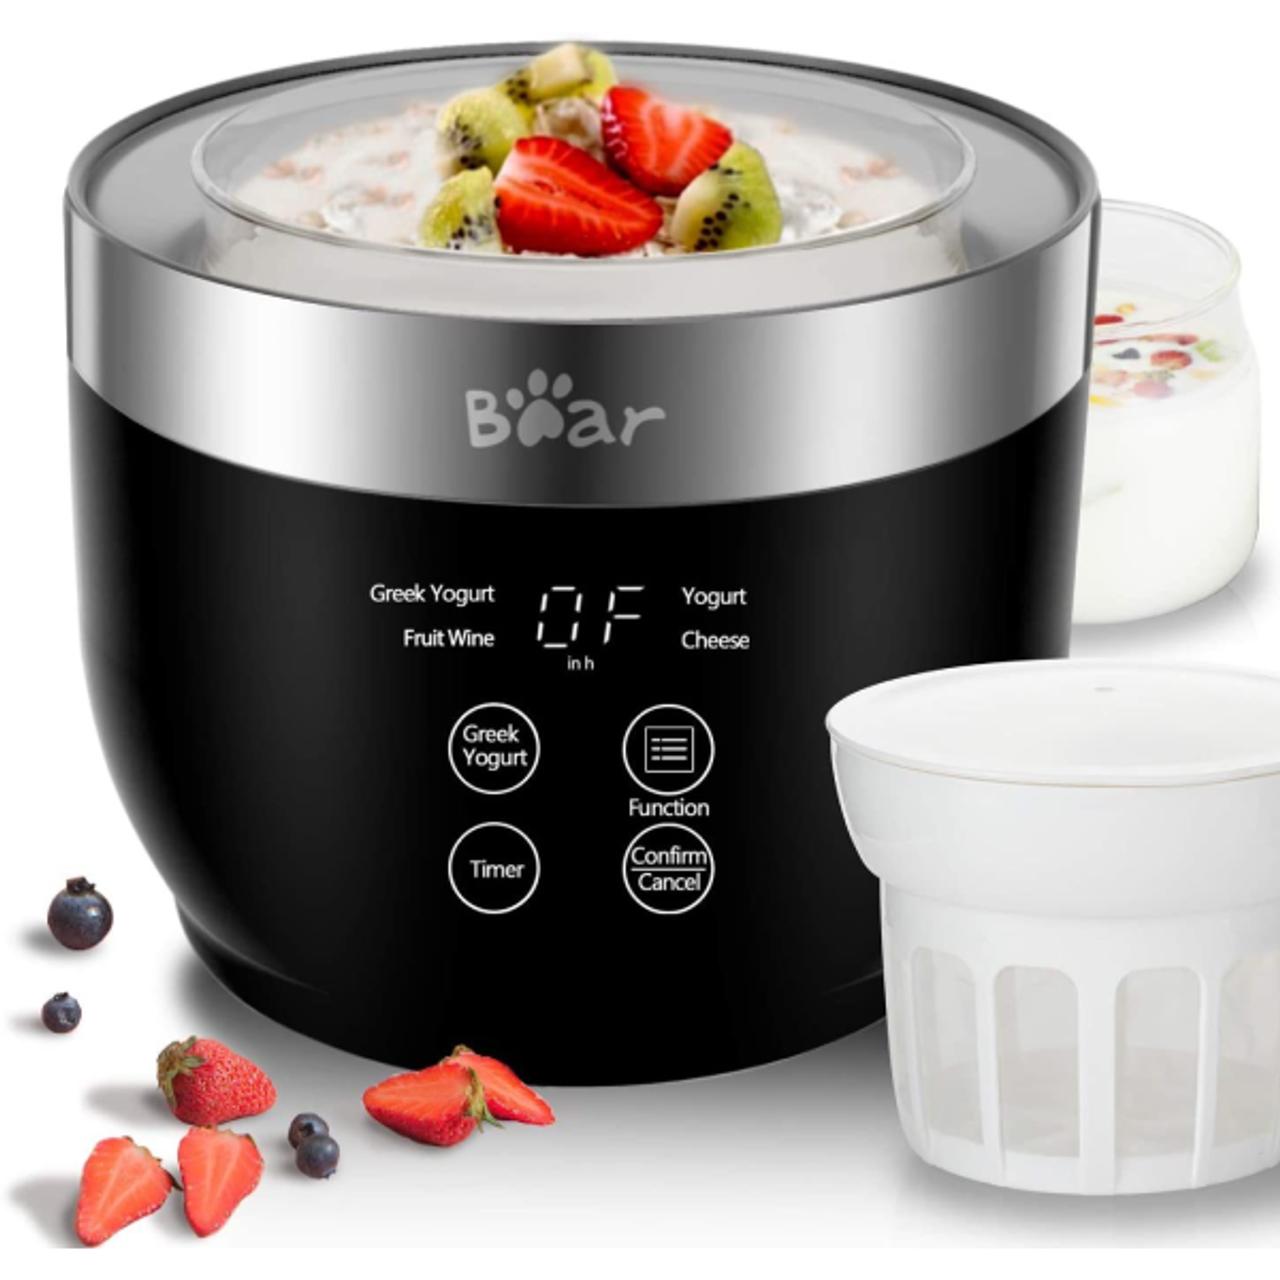 Automatic Digital Yogurt Maker! .99 (REG .99) + Free Shipping at Until Gone!